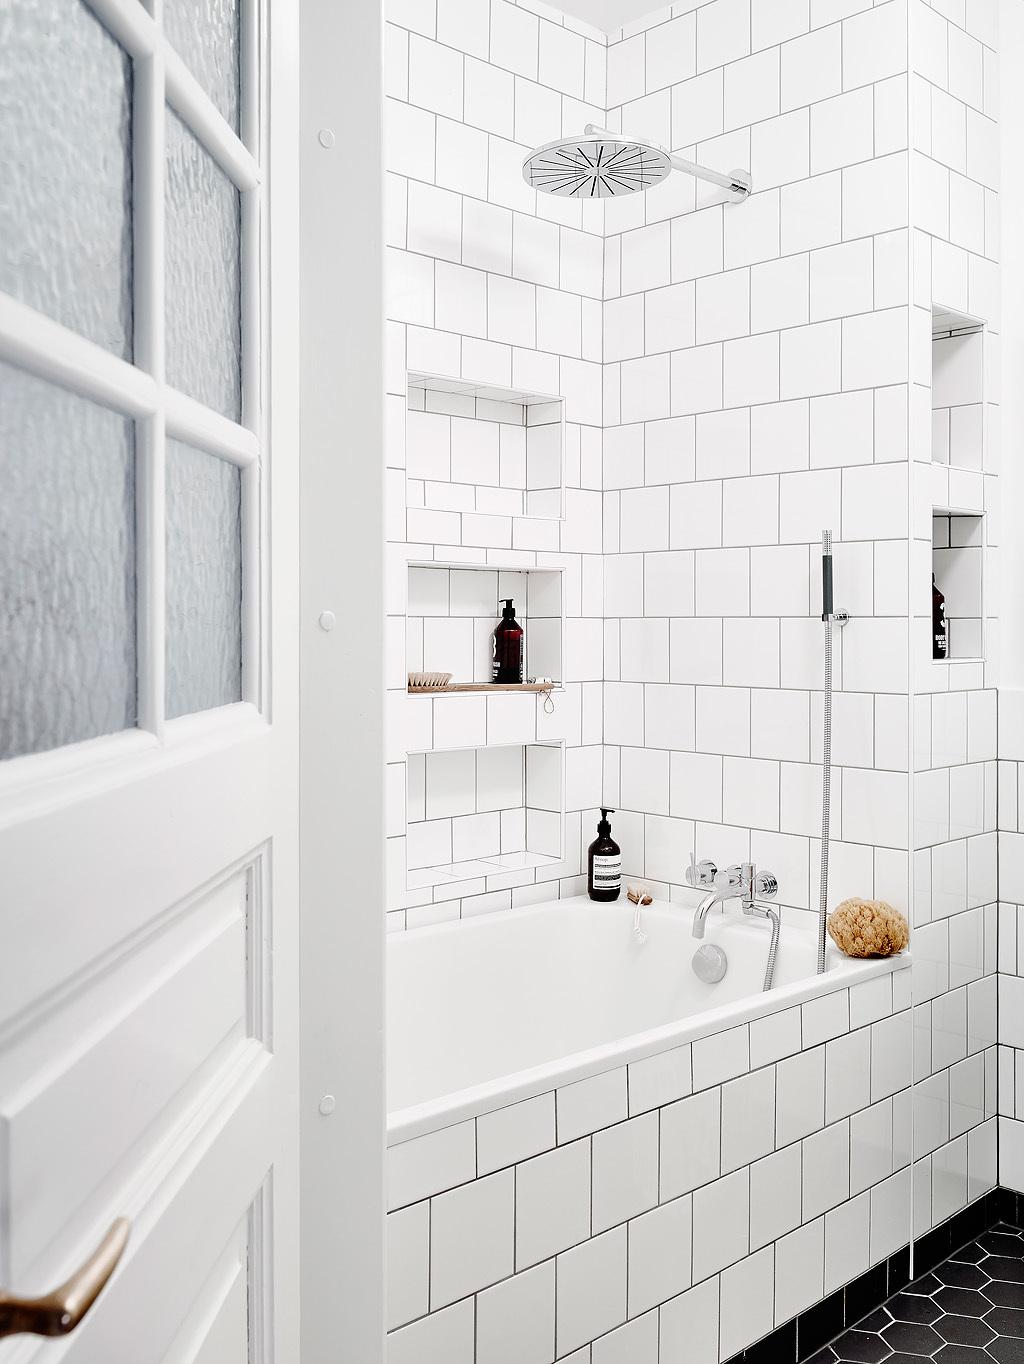 Bygg hyllnischer i badrummet! | Badrumsdrömmar